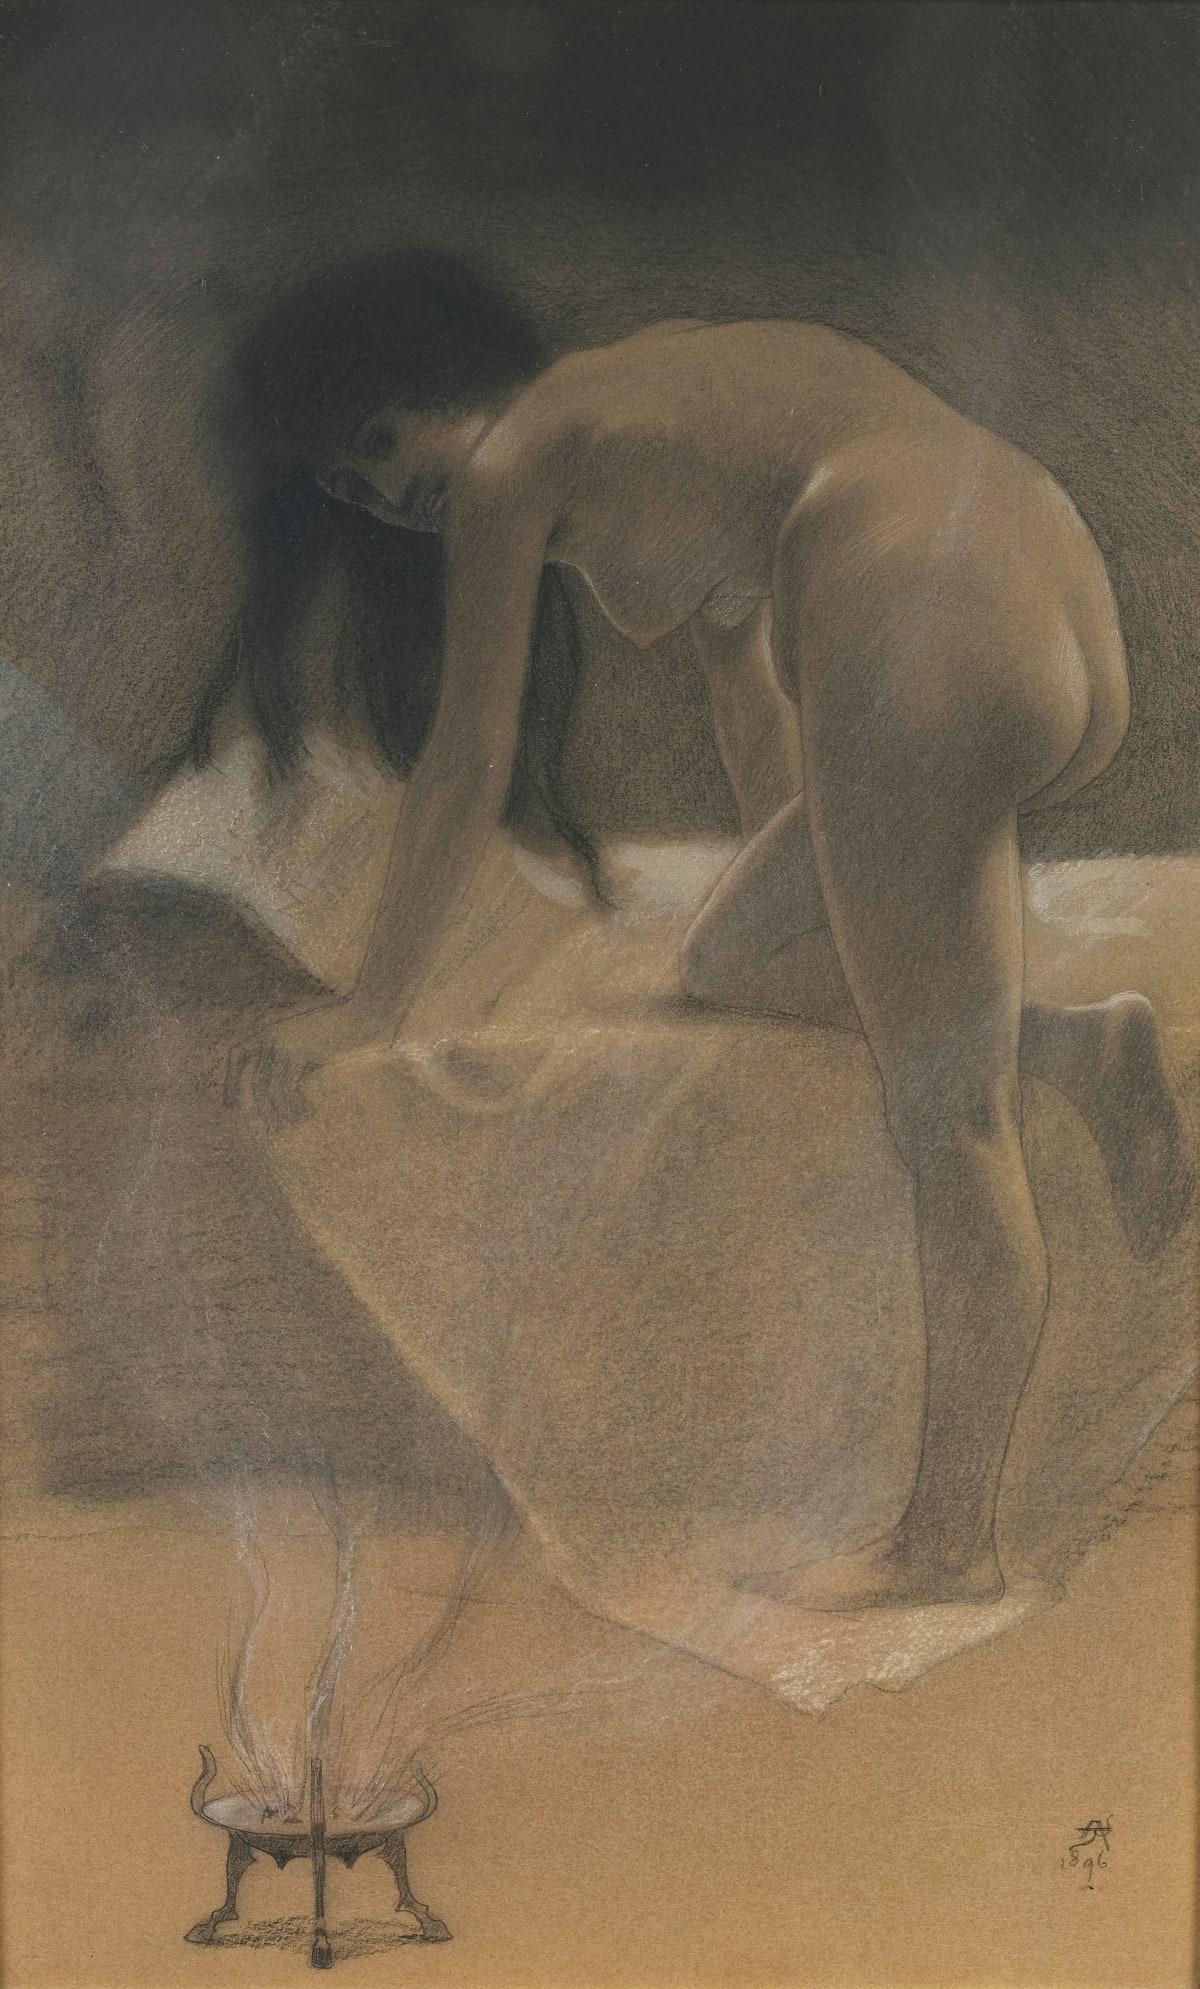 Armand Rassenfosse, La Sorcière, 1896